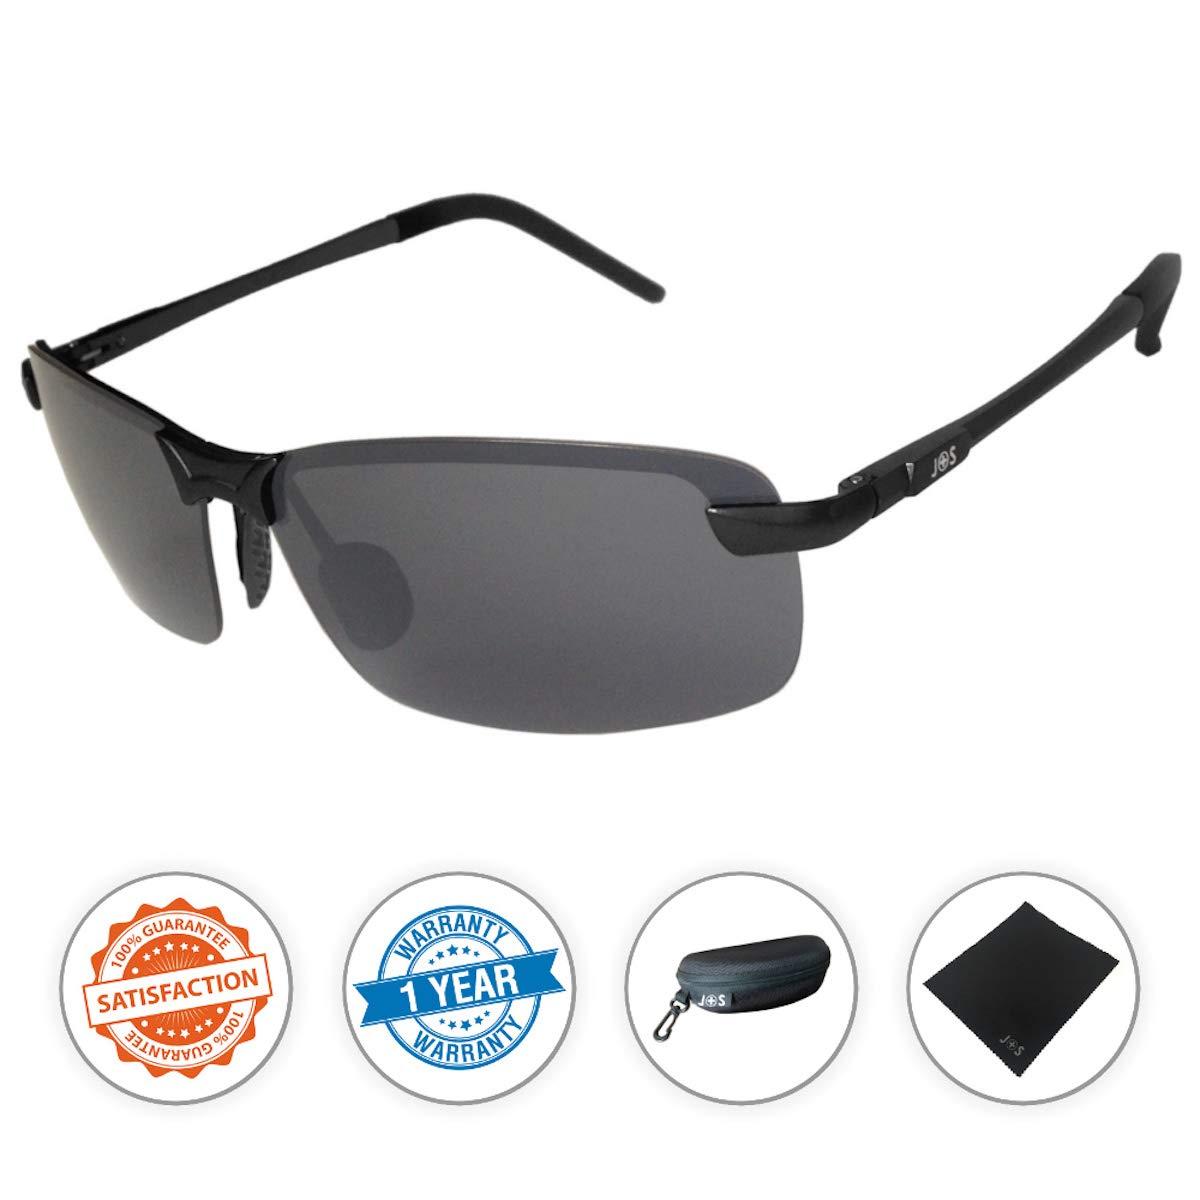 215c671031 Amazon.com  J+S Ultra Lightweight Men s Rimless Sports Sunglasses ...